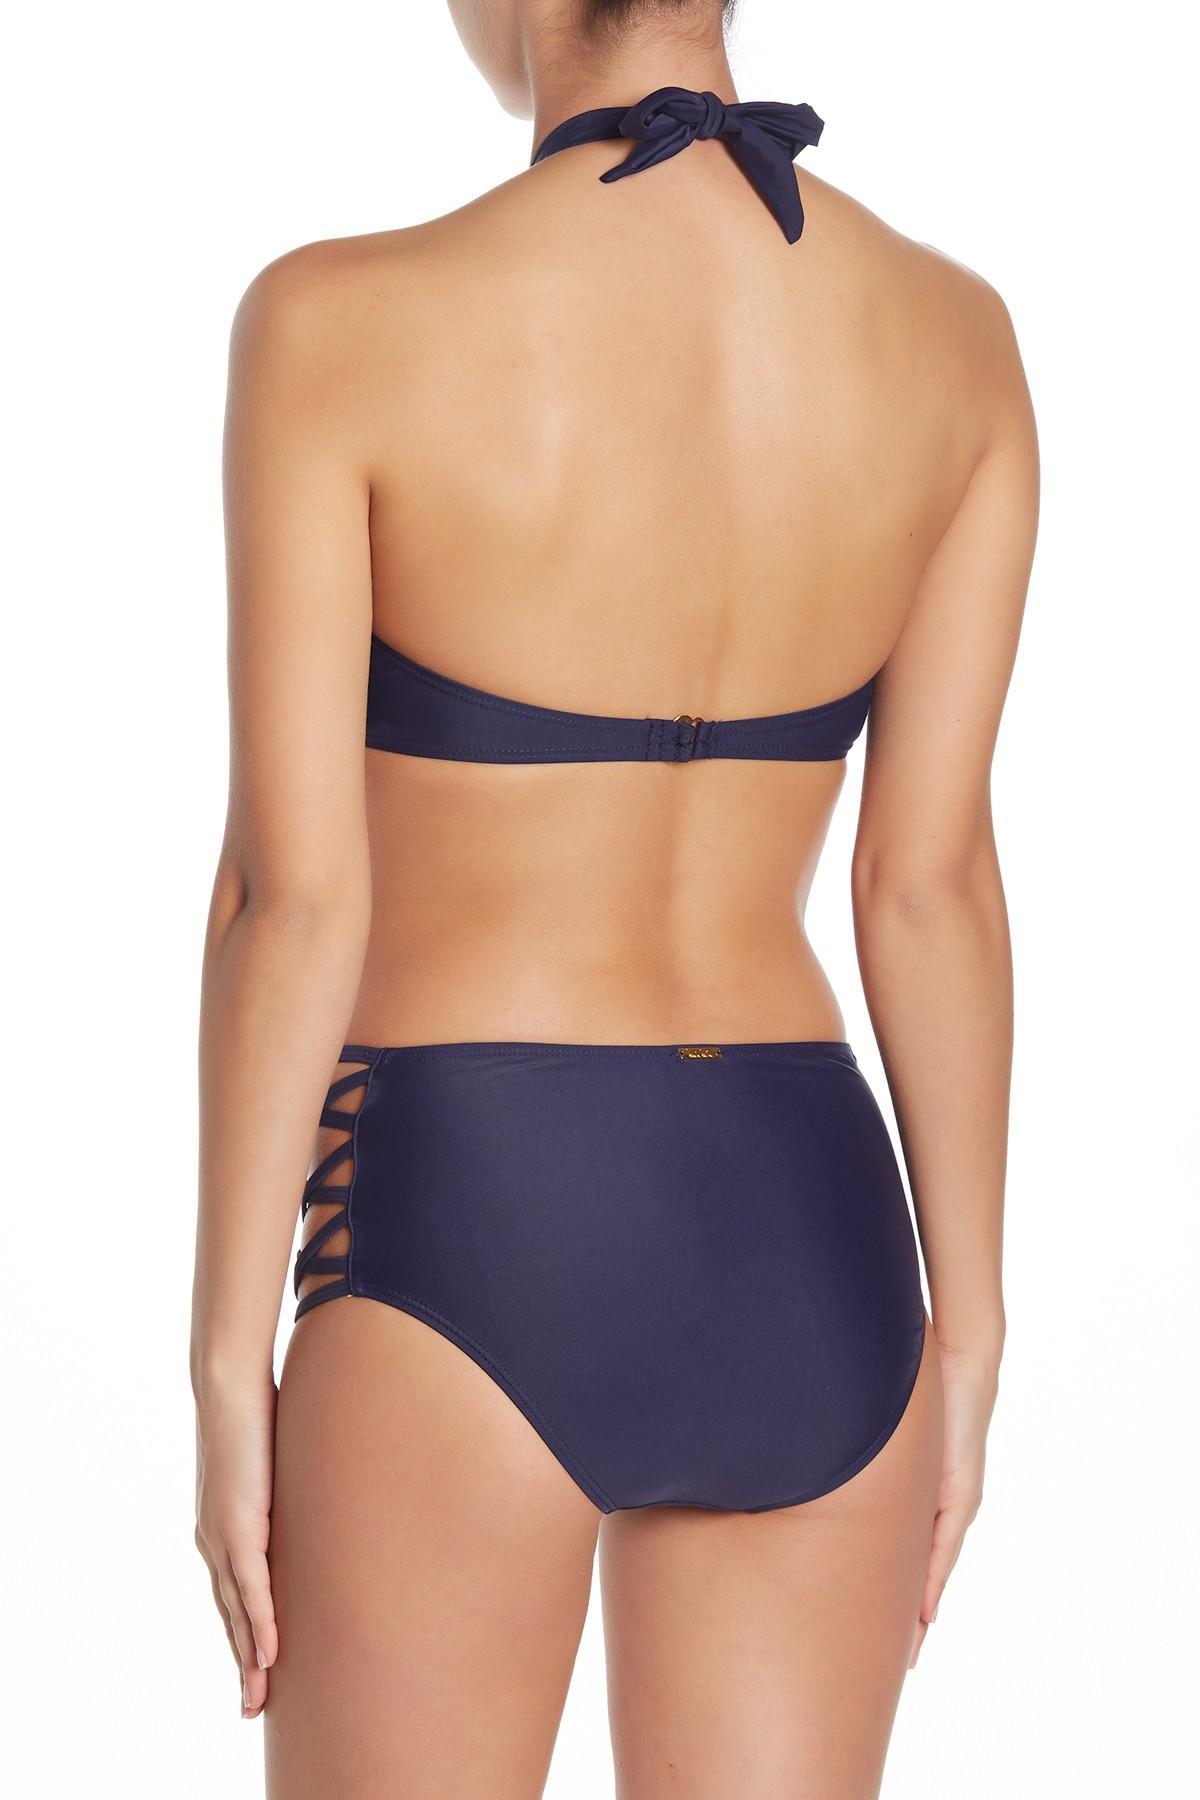 top Blue criss cross bikini